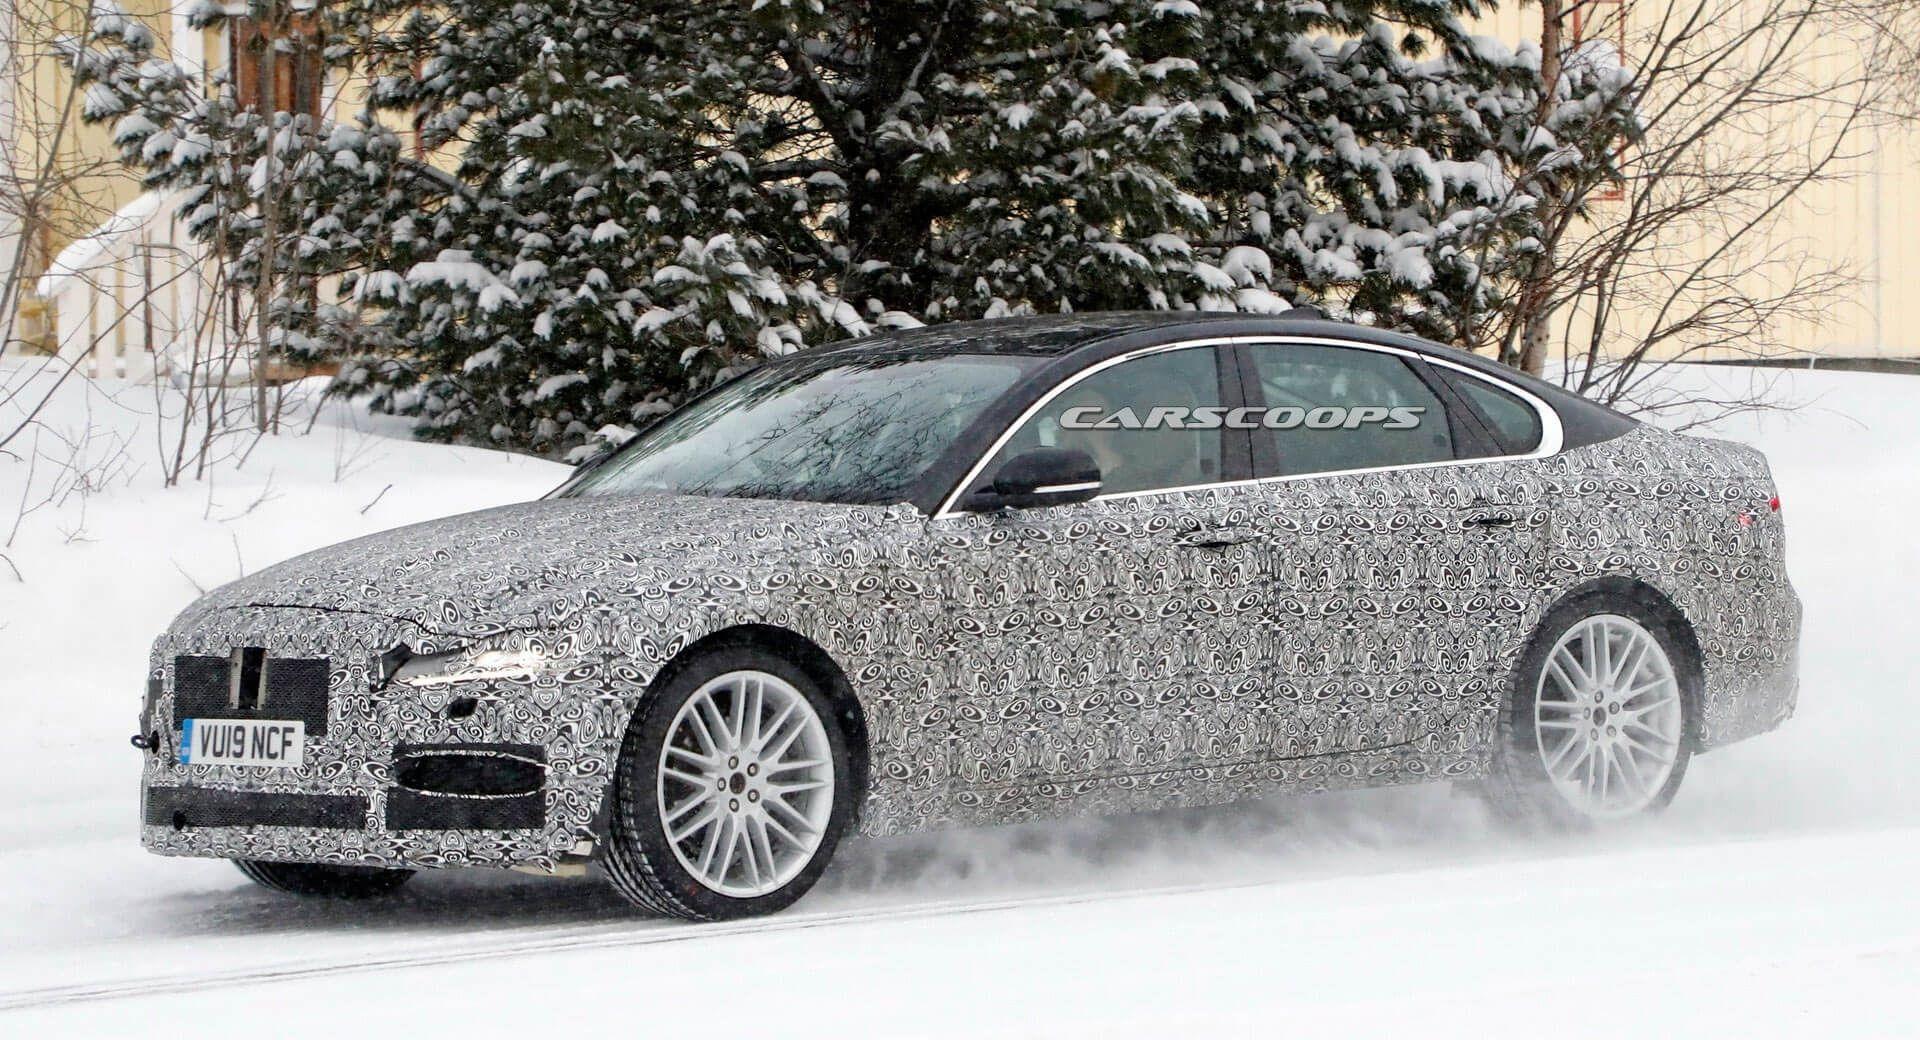 2021 Jaguar Xe Sedan Concept and Review